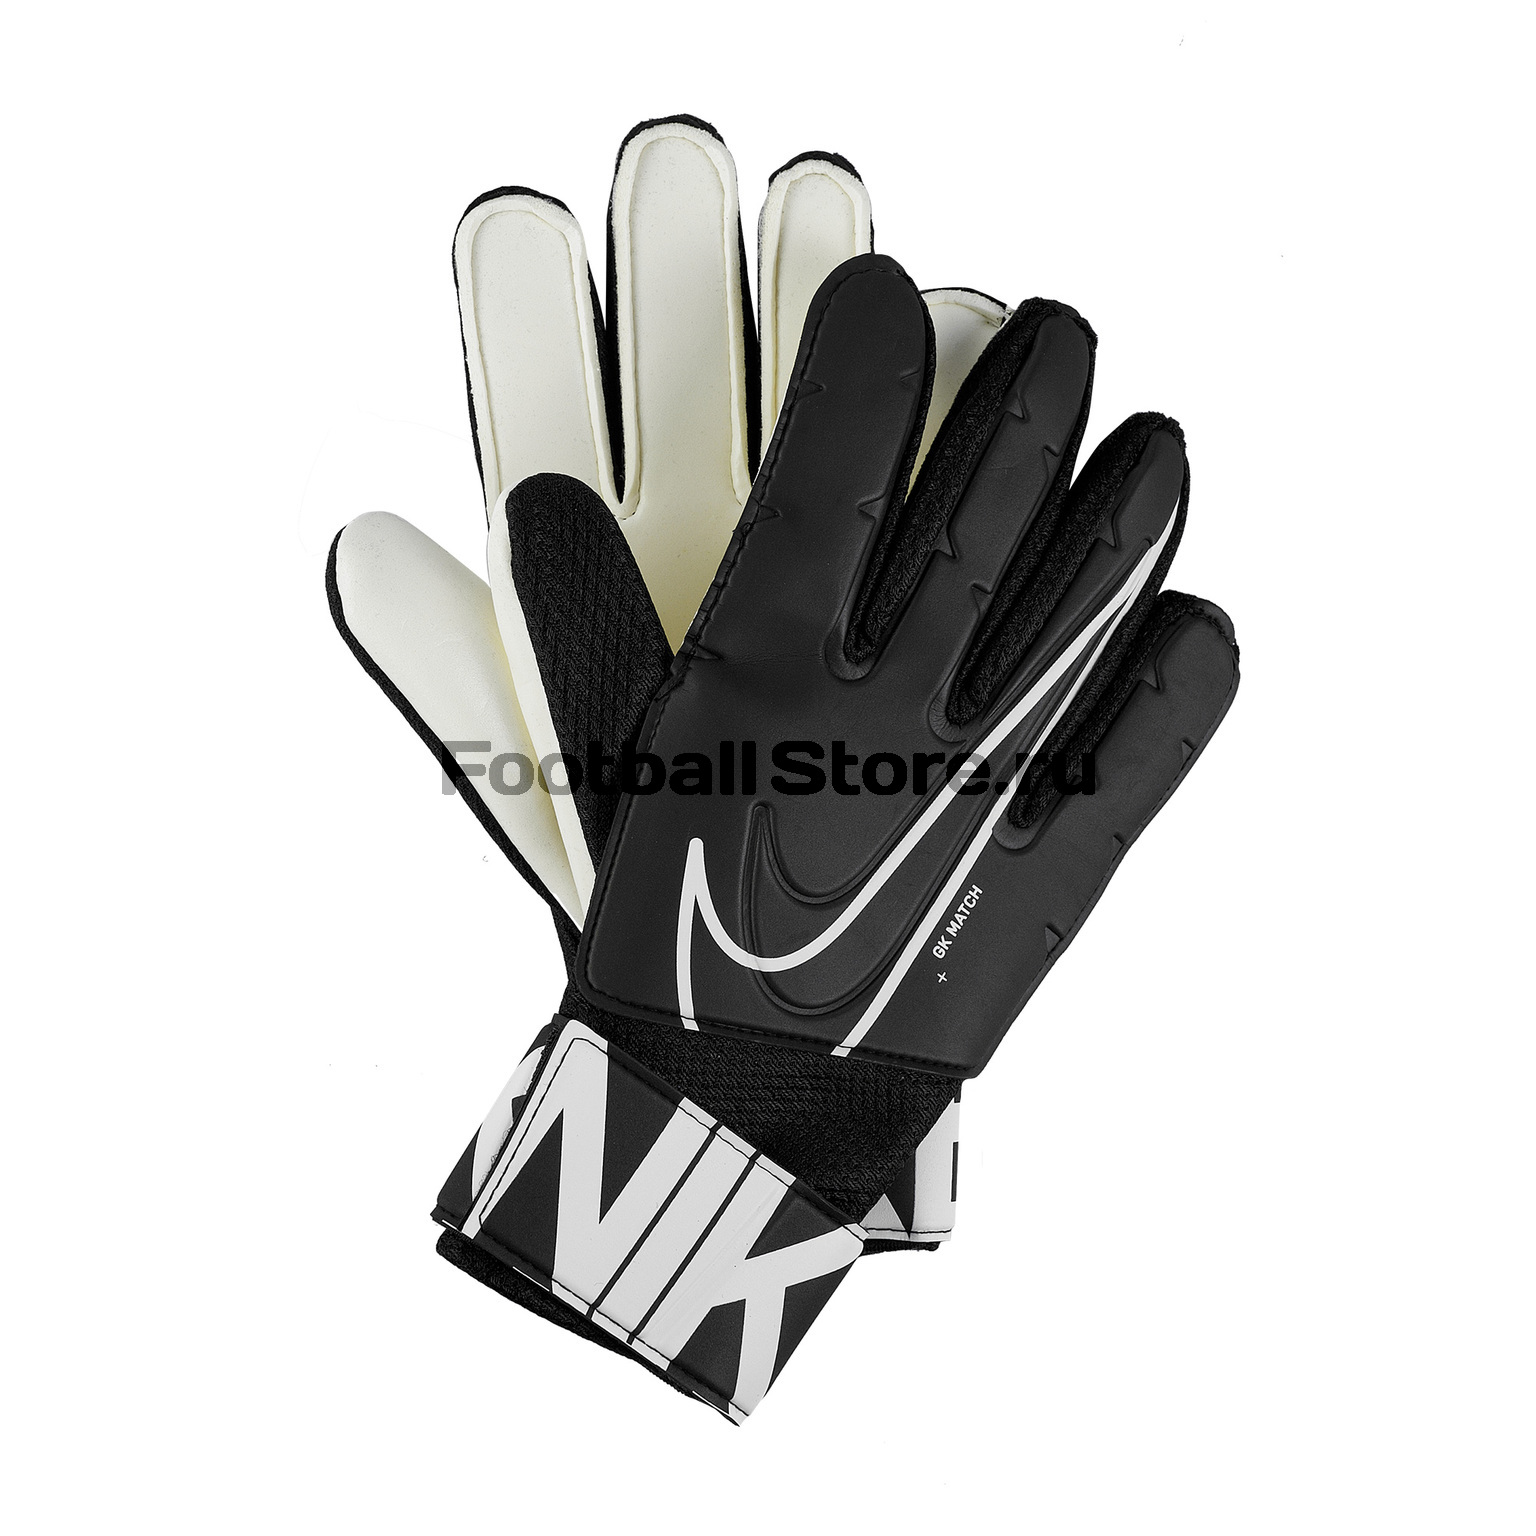 Перчатки вратарские Nike Match GS3882-010